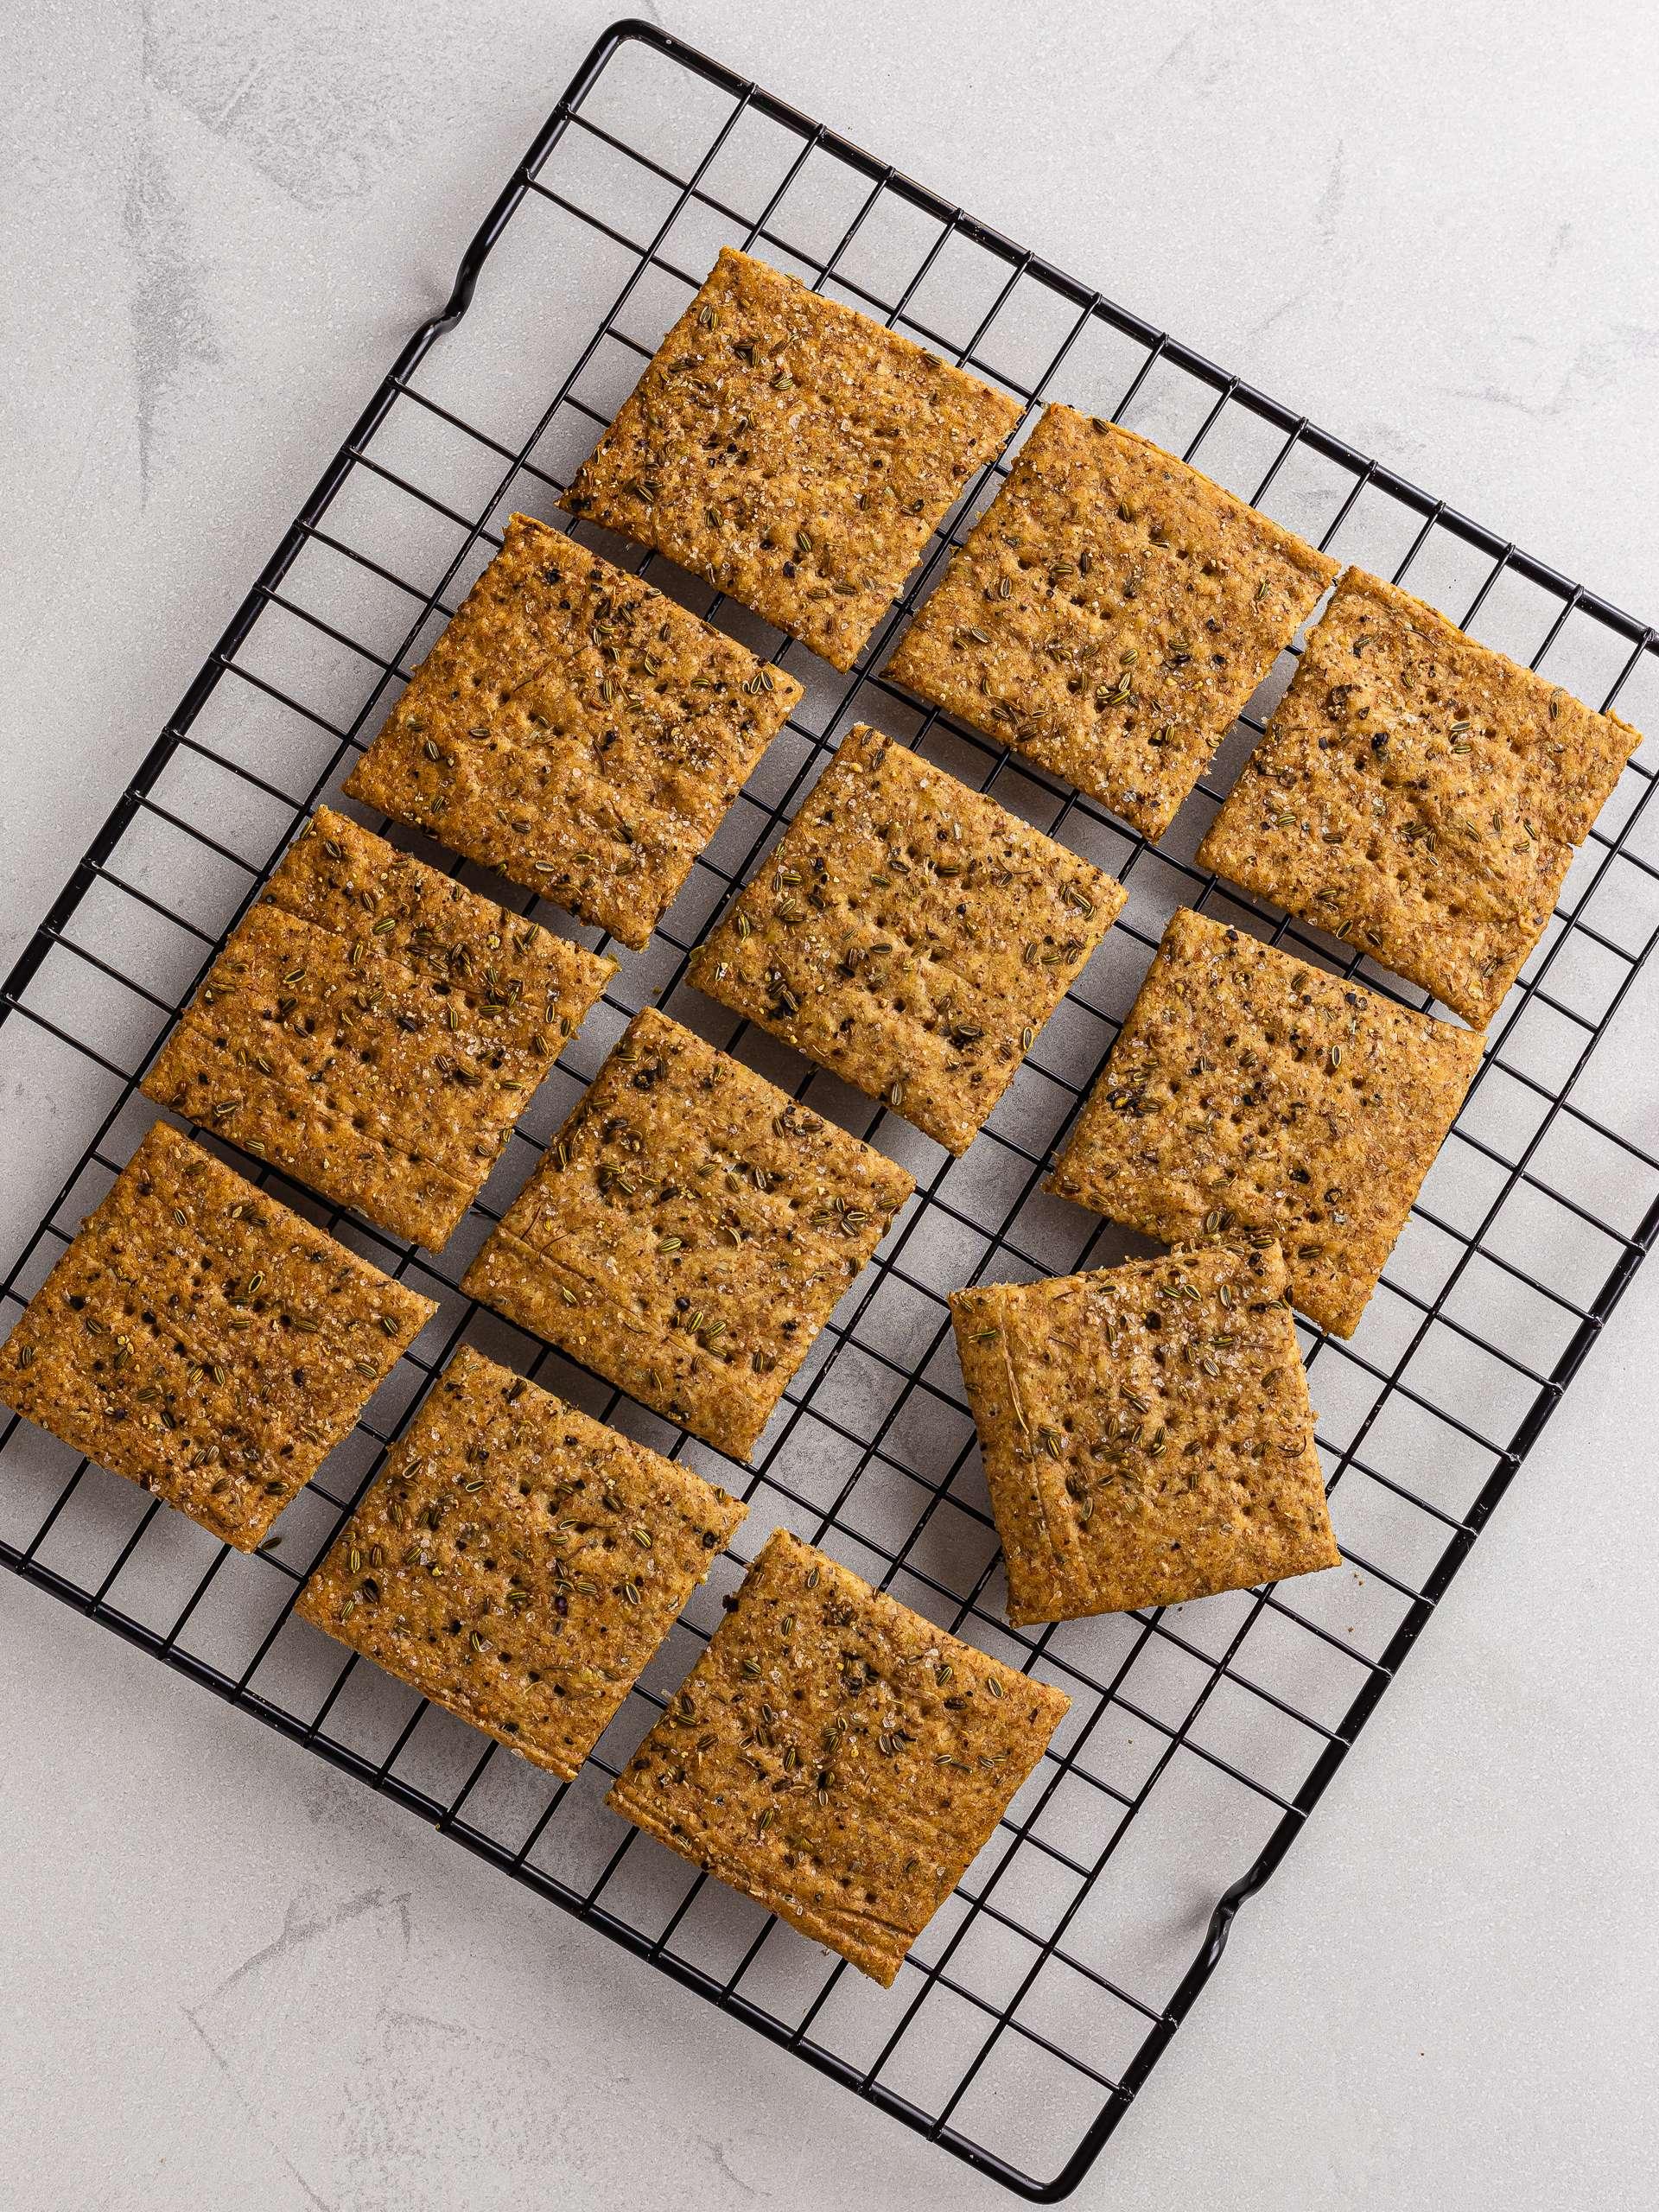 baked fennel sourdough crackers on a rack